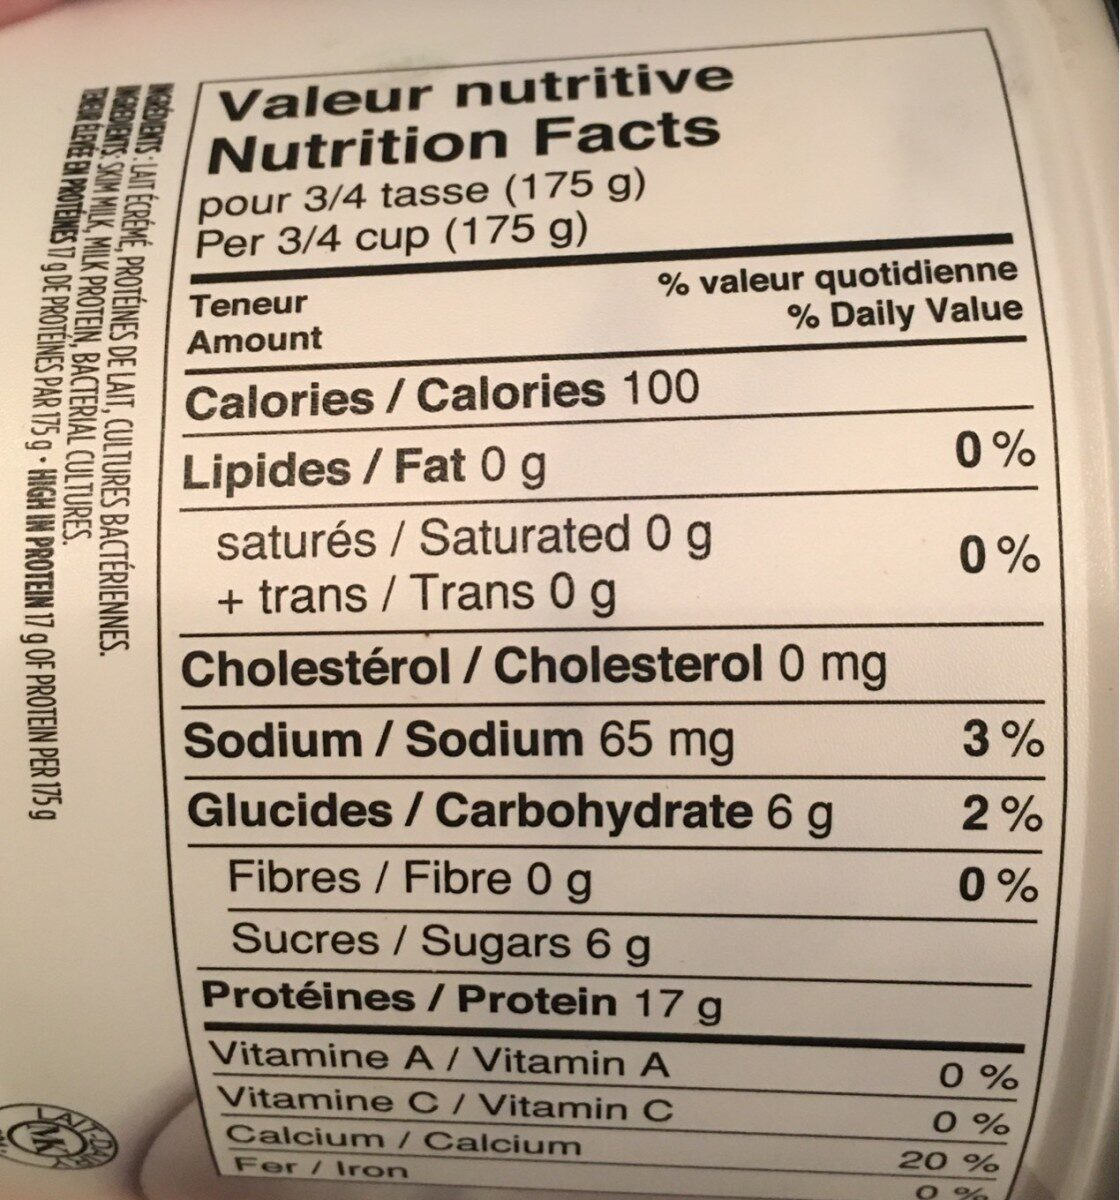 Liberté Grec (0% MG) - Nutrition facts - fr